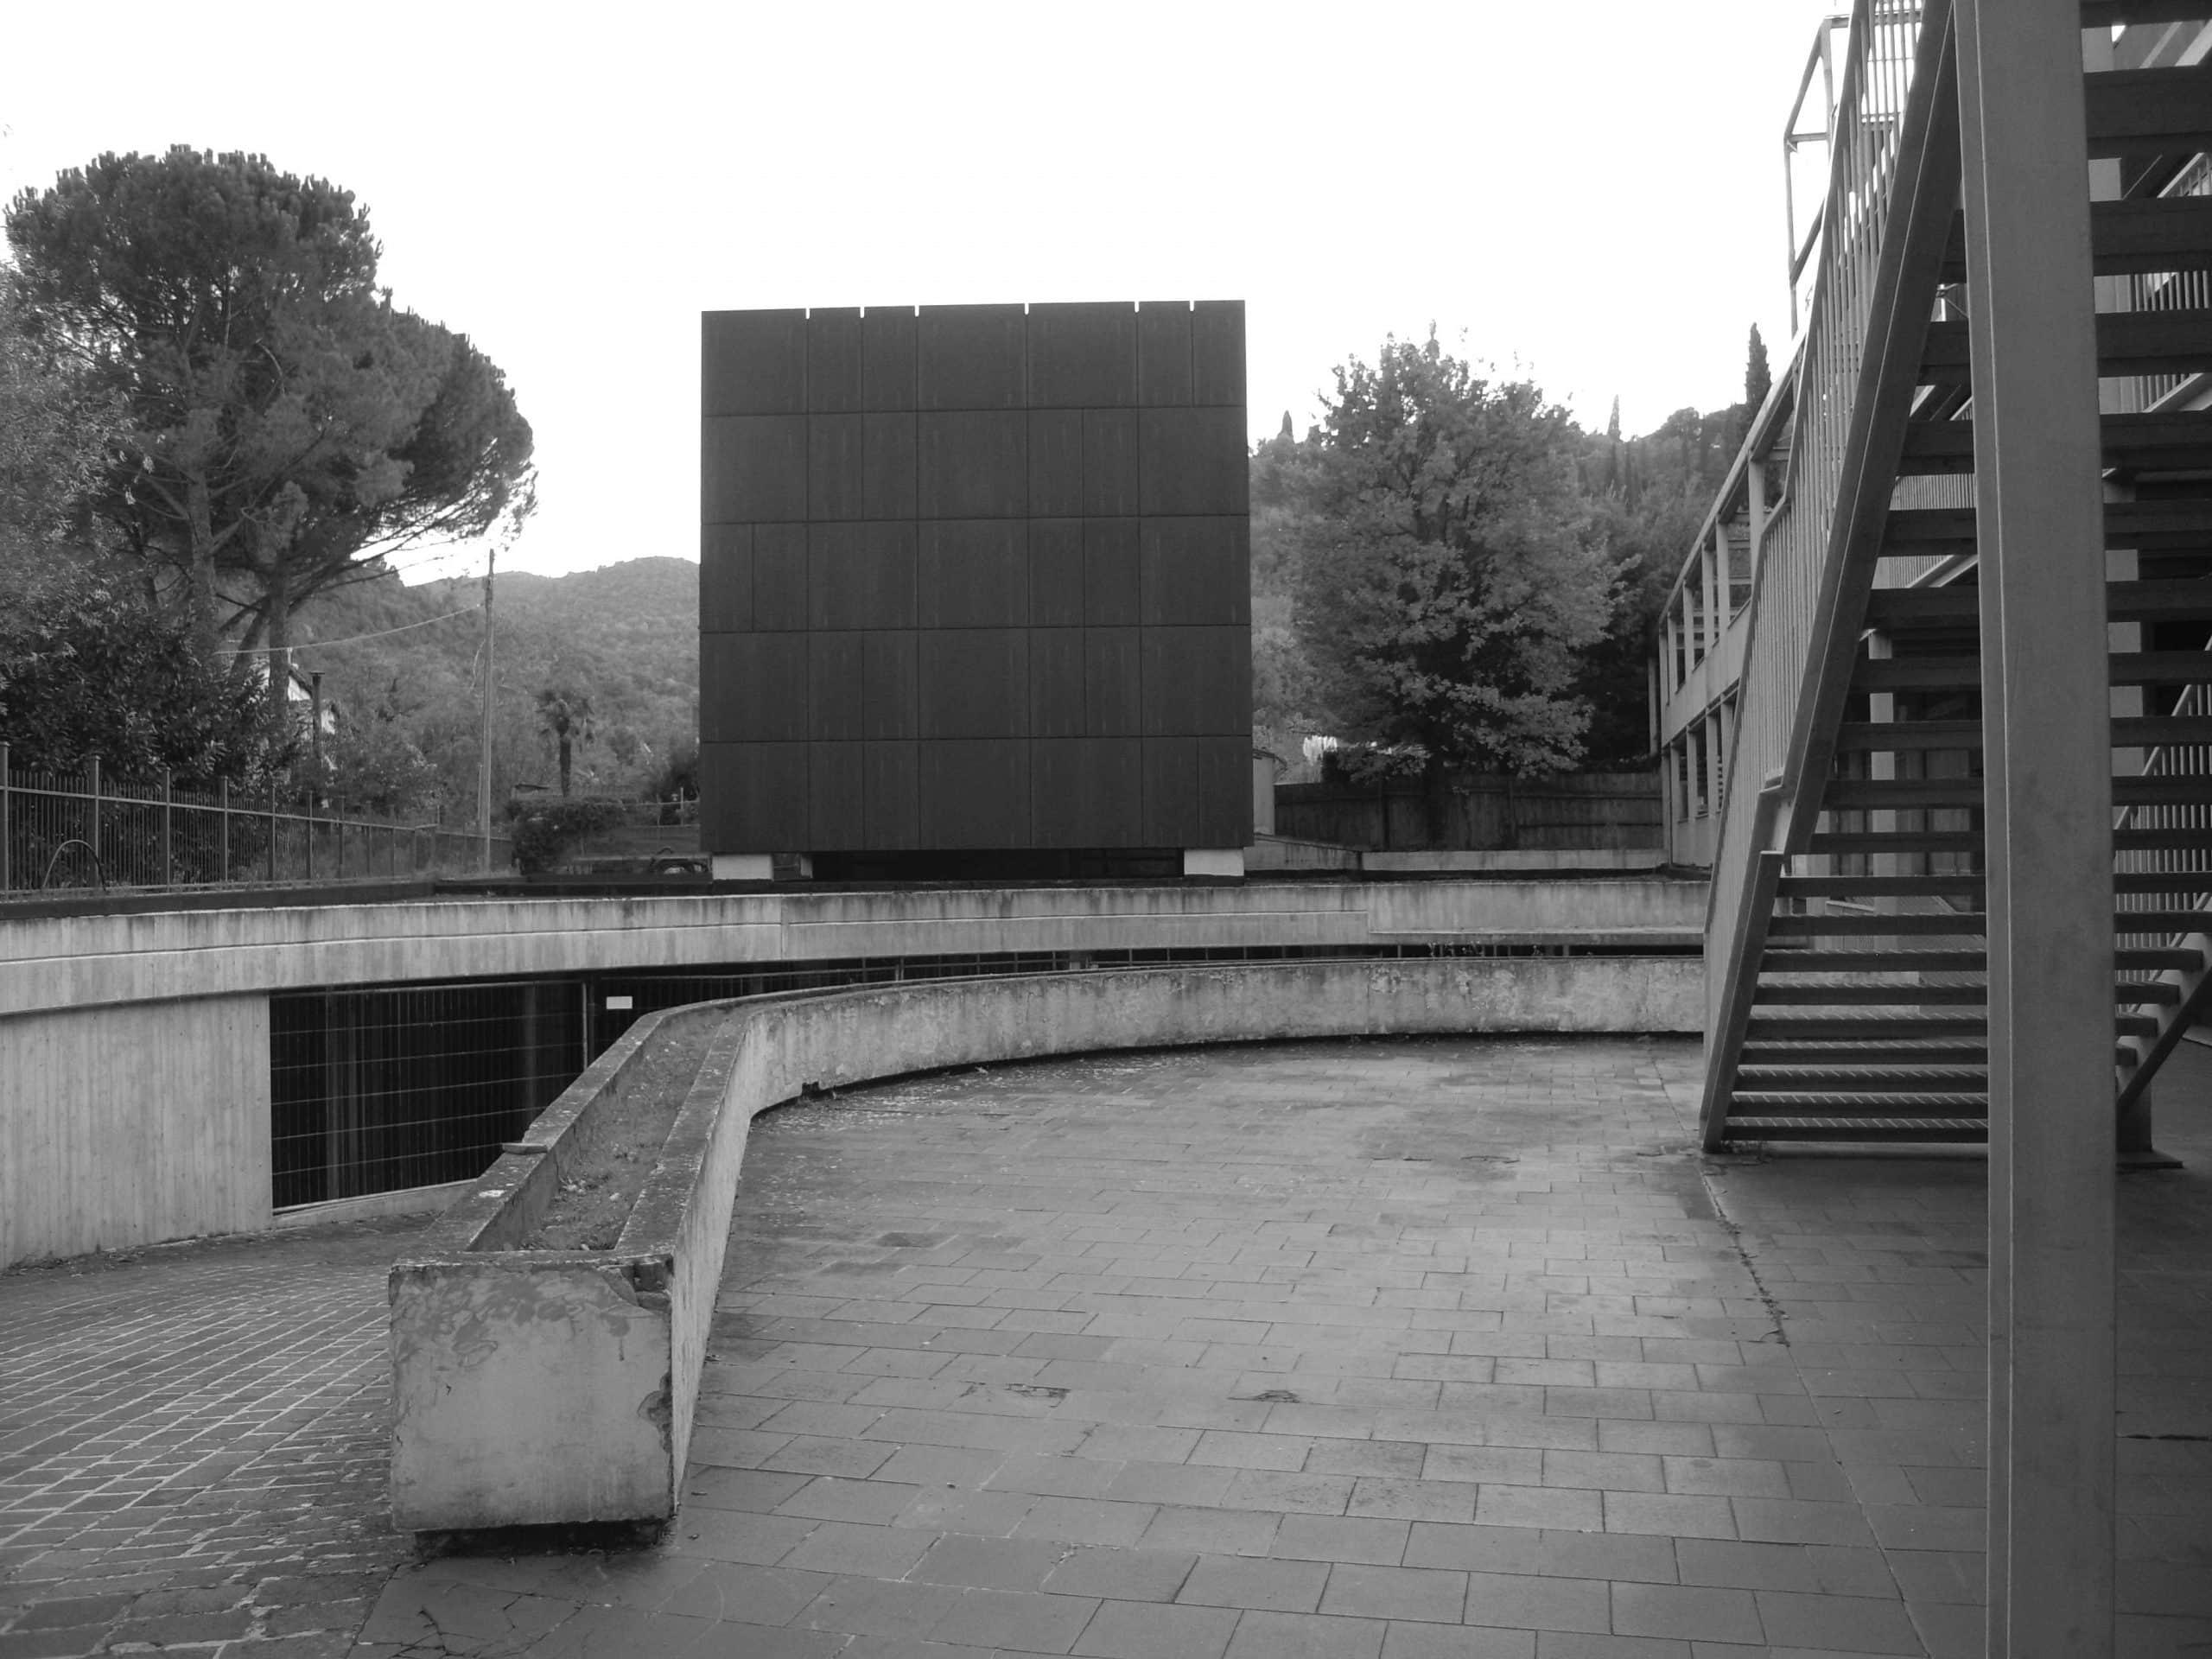 "24 -  Casa degli artisti ""Kubo"" annessa all'Hotel Albornoz, Spoleto (PG) - Vista esterna"